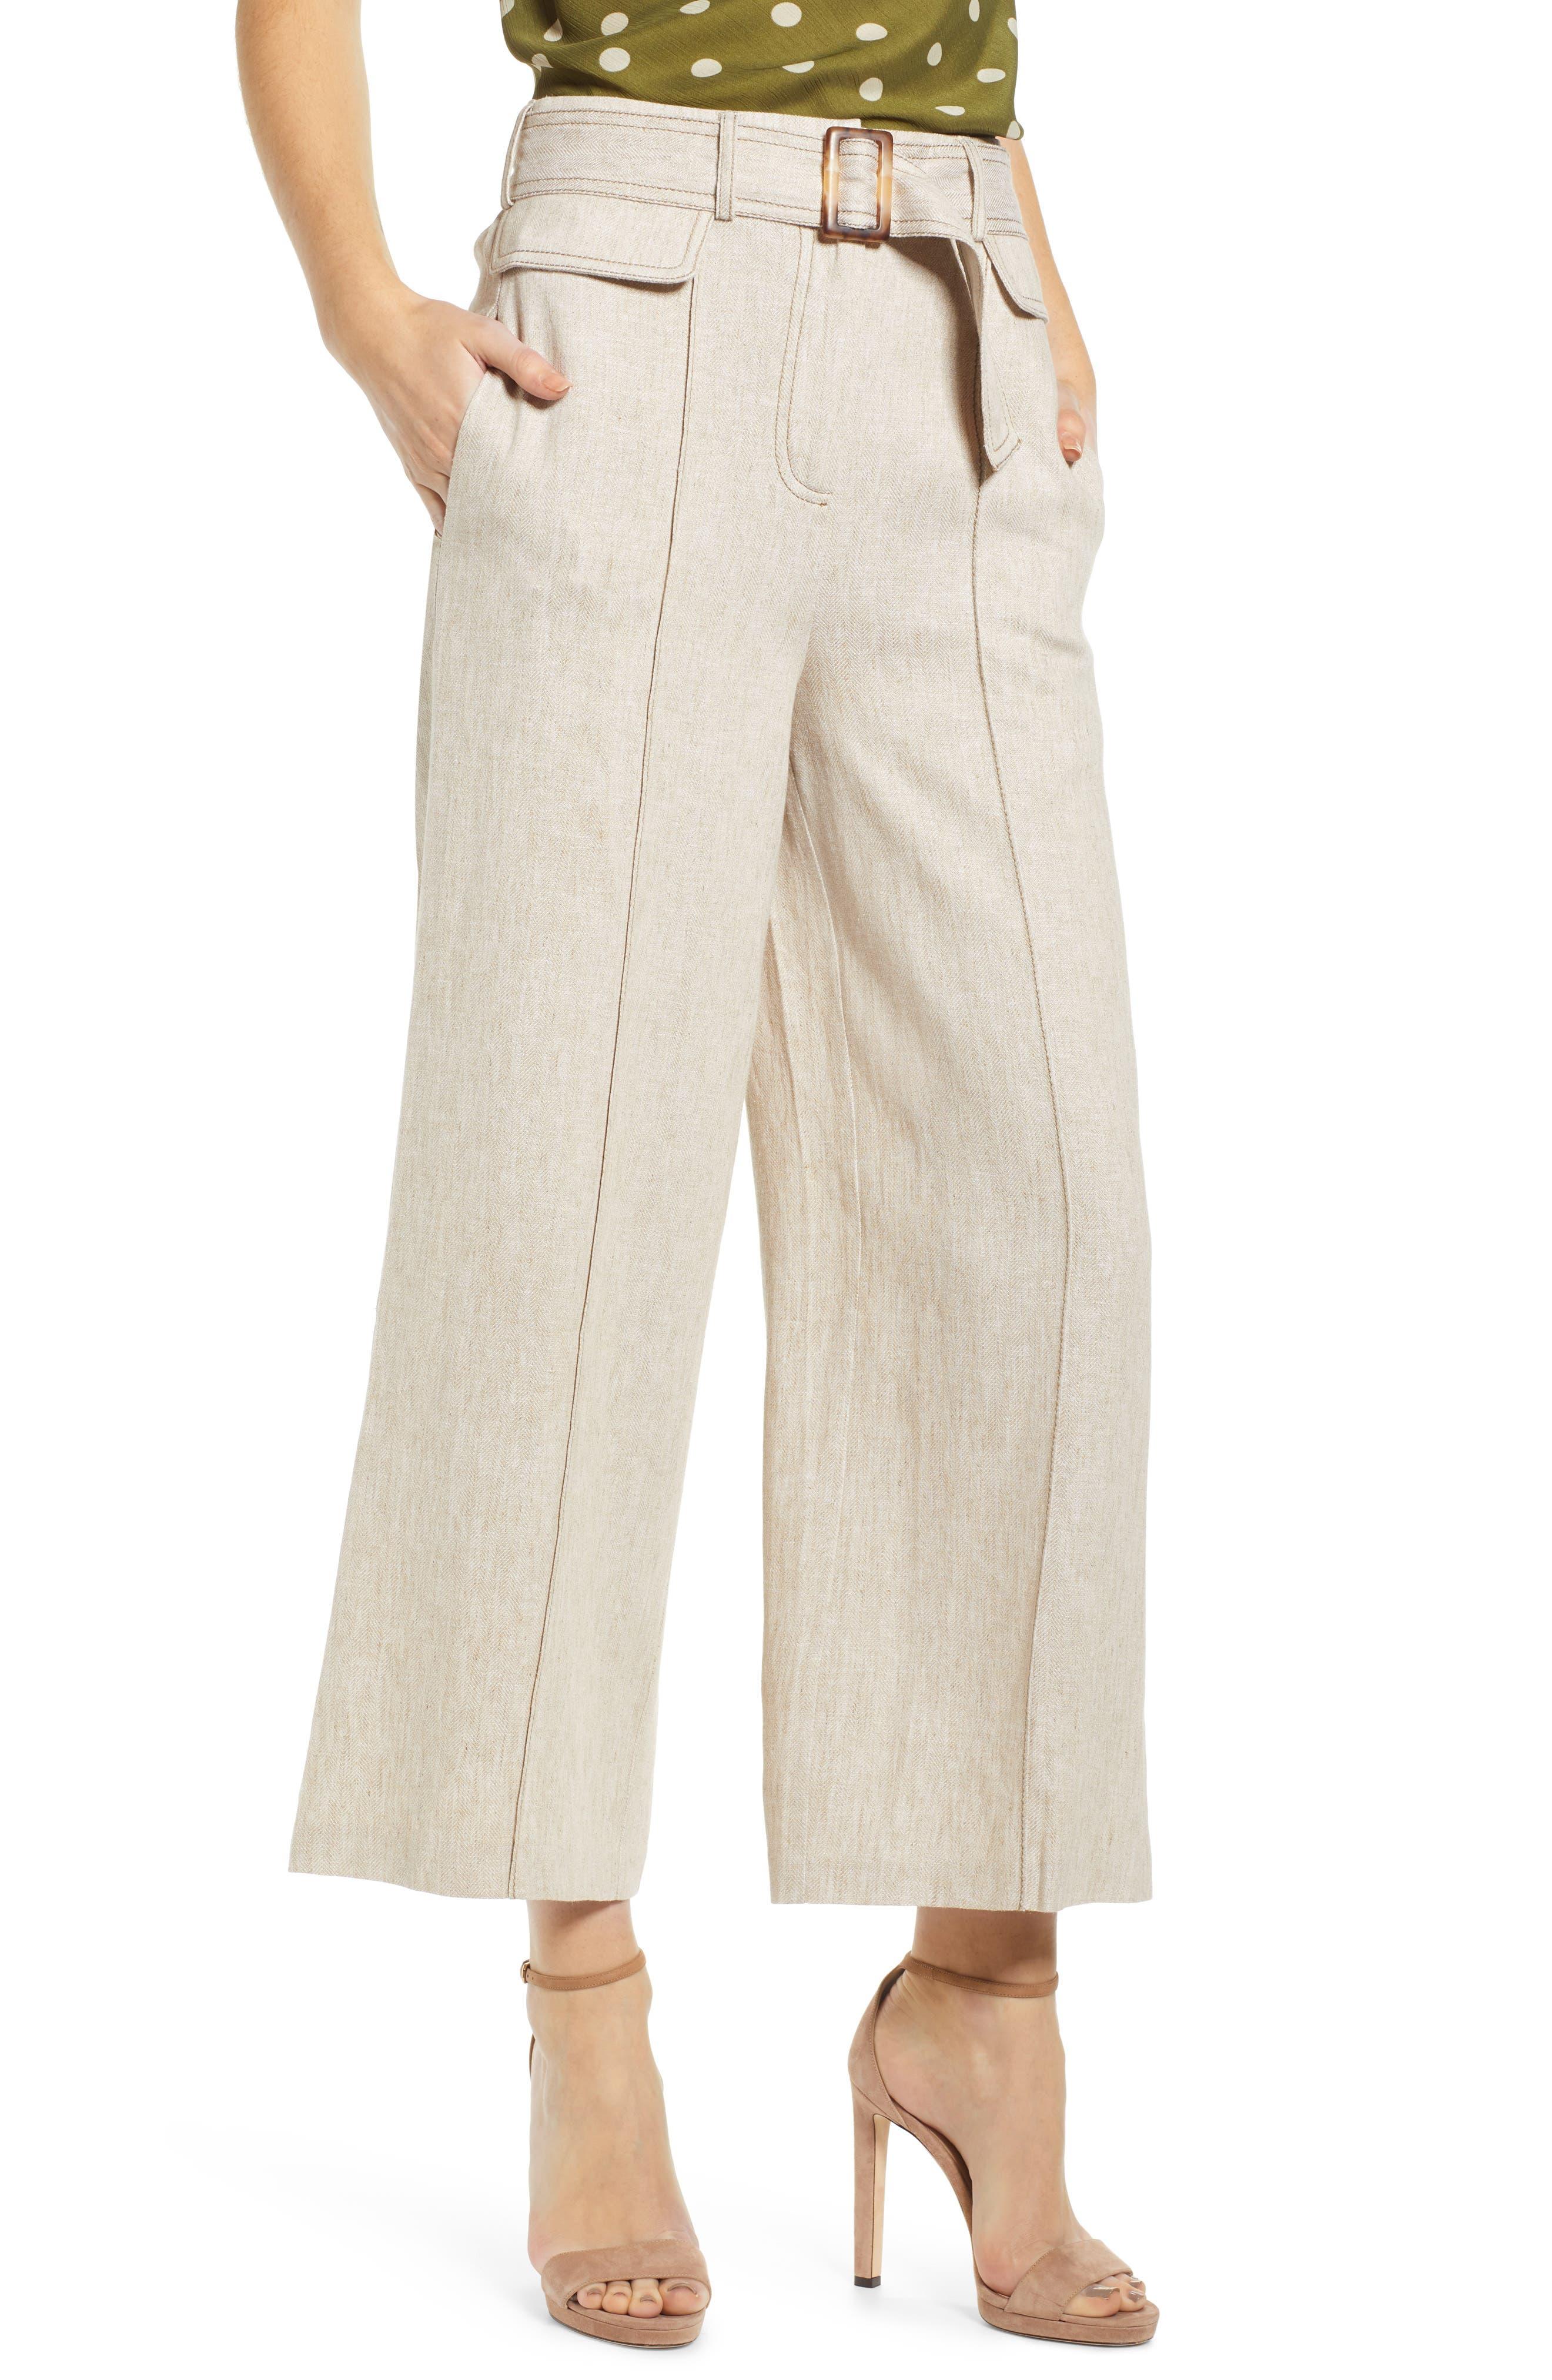 Chriselle Lim Toulouse Wide Leg Crop Trousers, Main, color, OATMEAL